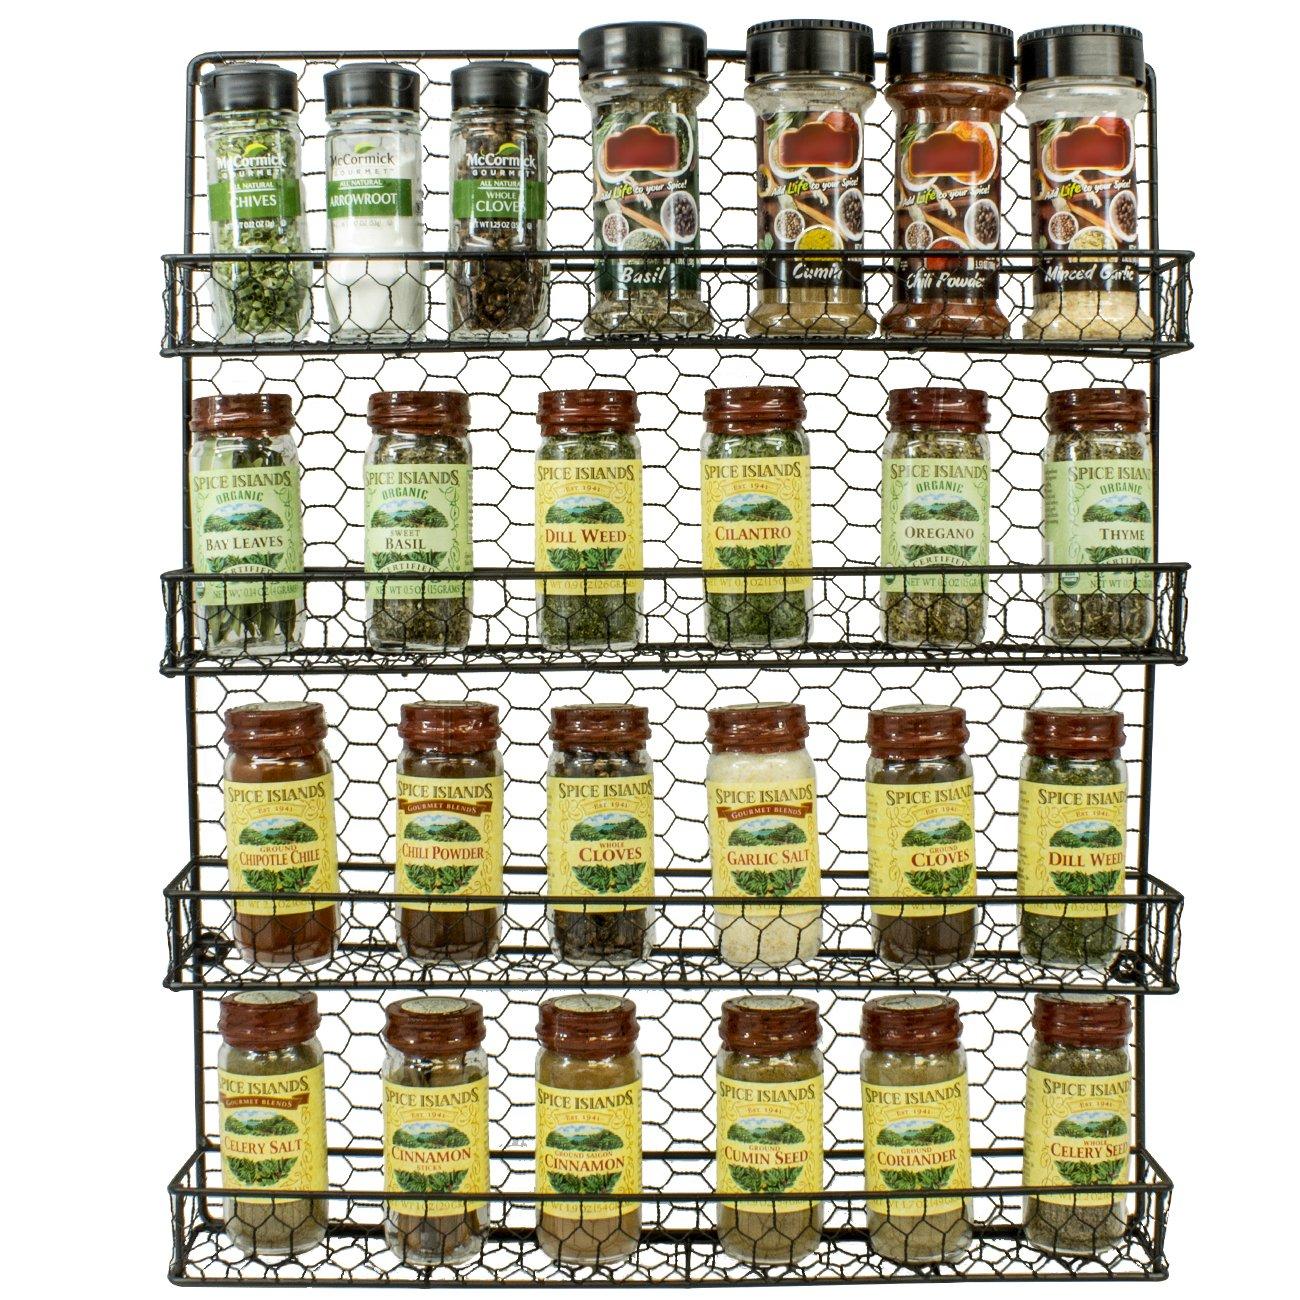 Tier Spice Rack Amazoncom Sorbus Spice Rack And Multi Purpose Organizer